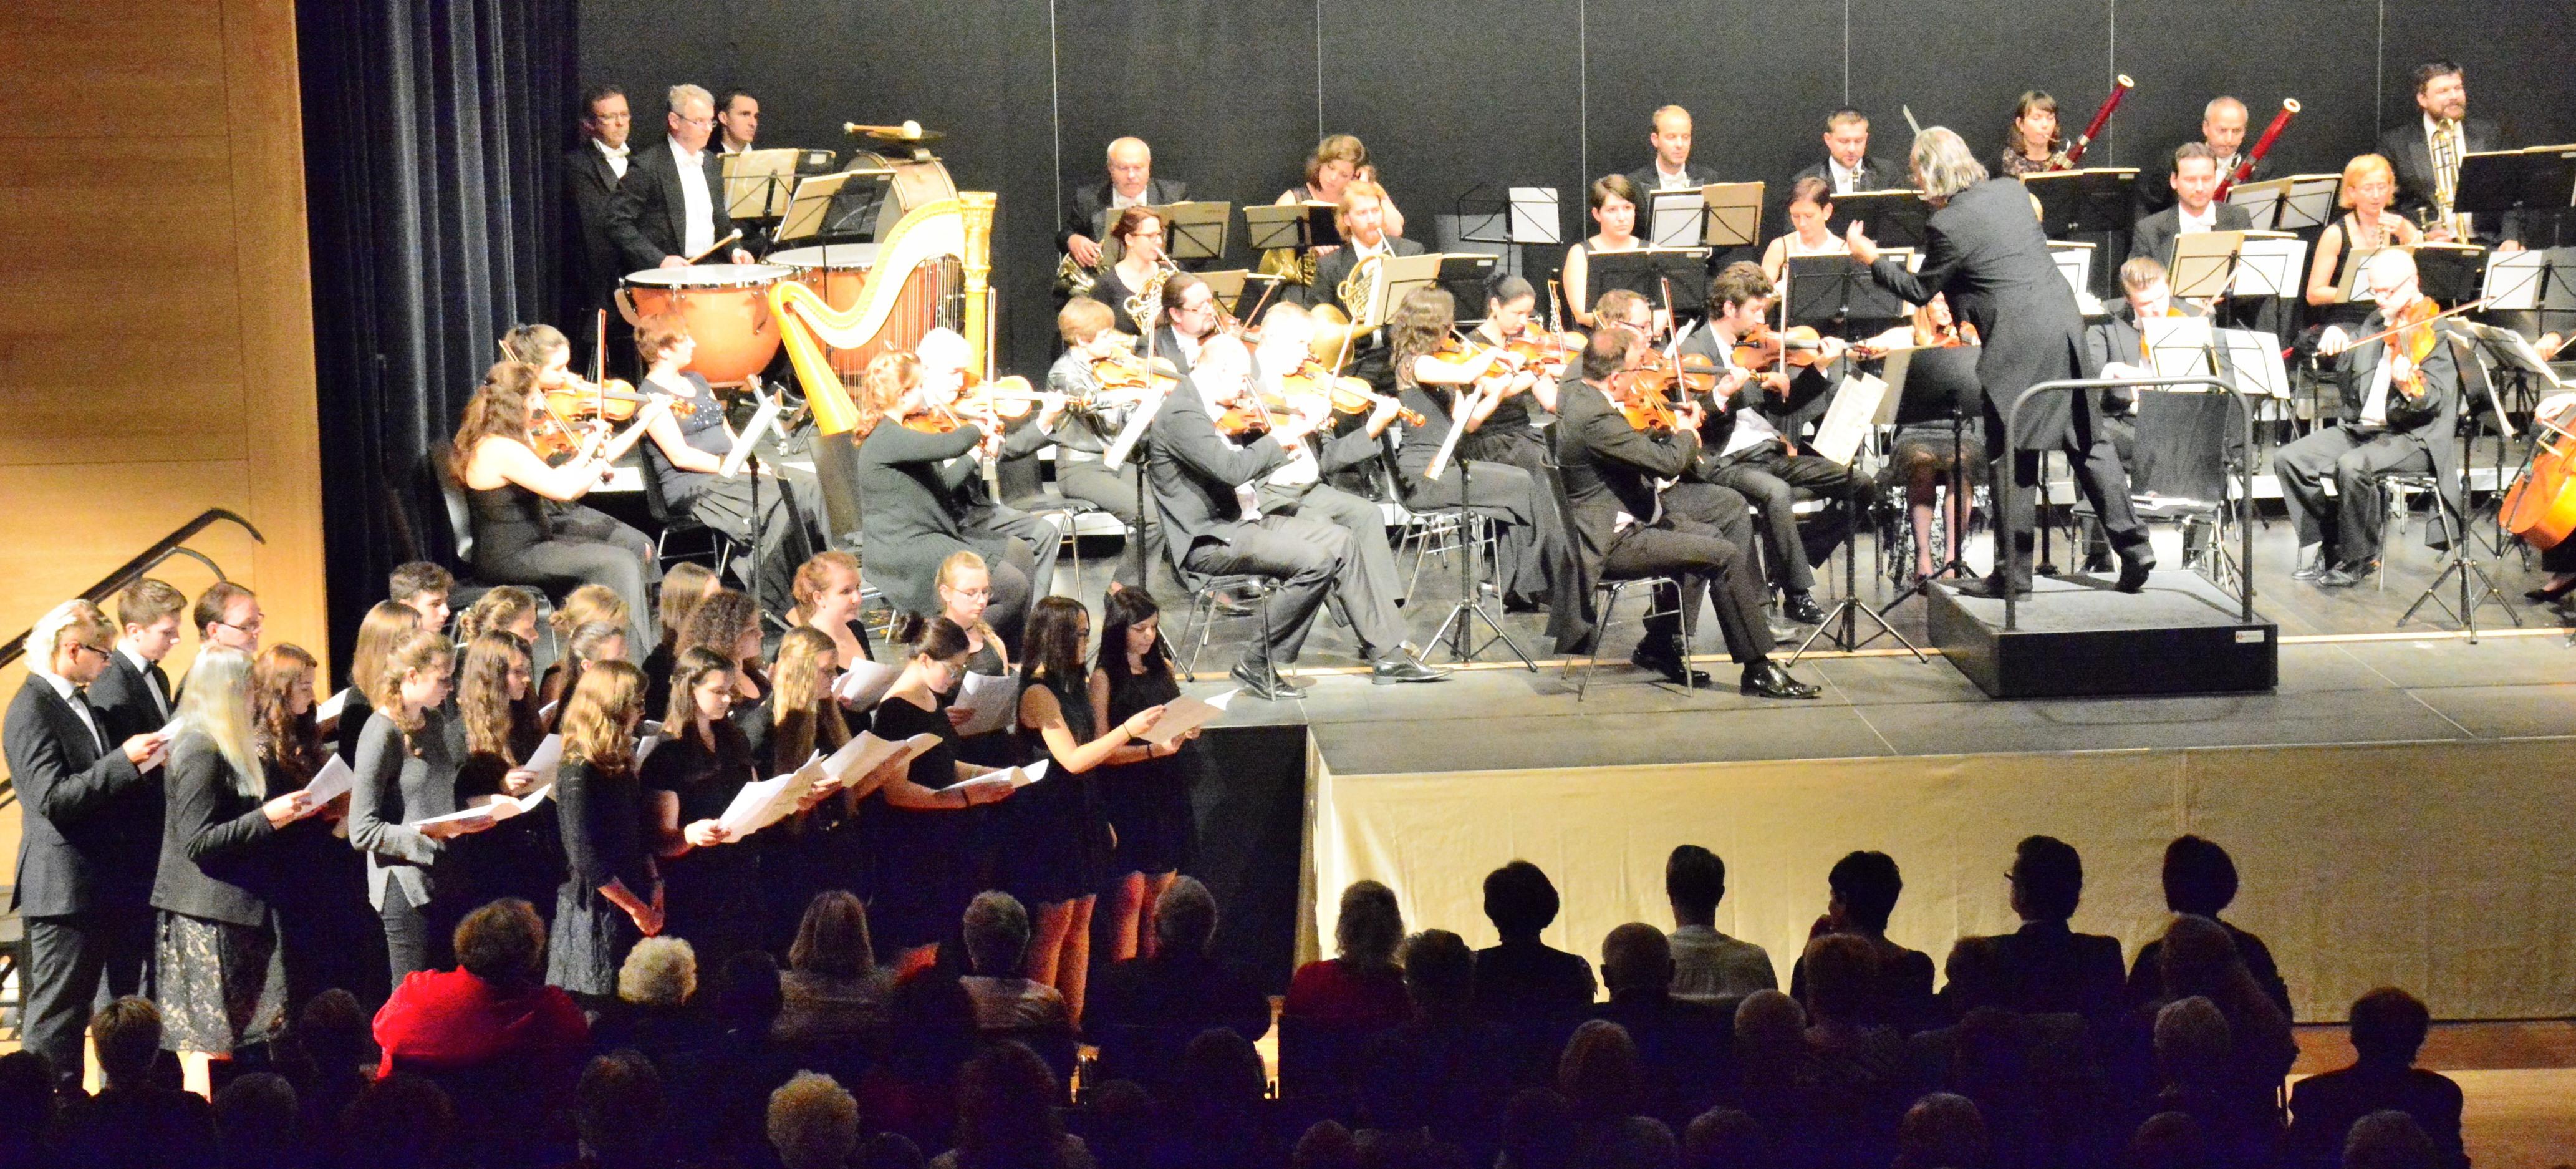 2.10.: Workshop-Chor des Regental-Gymnasiums Nittenau und Smetana Philharmoniker Prag